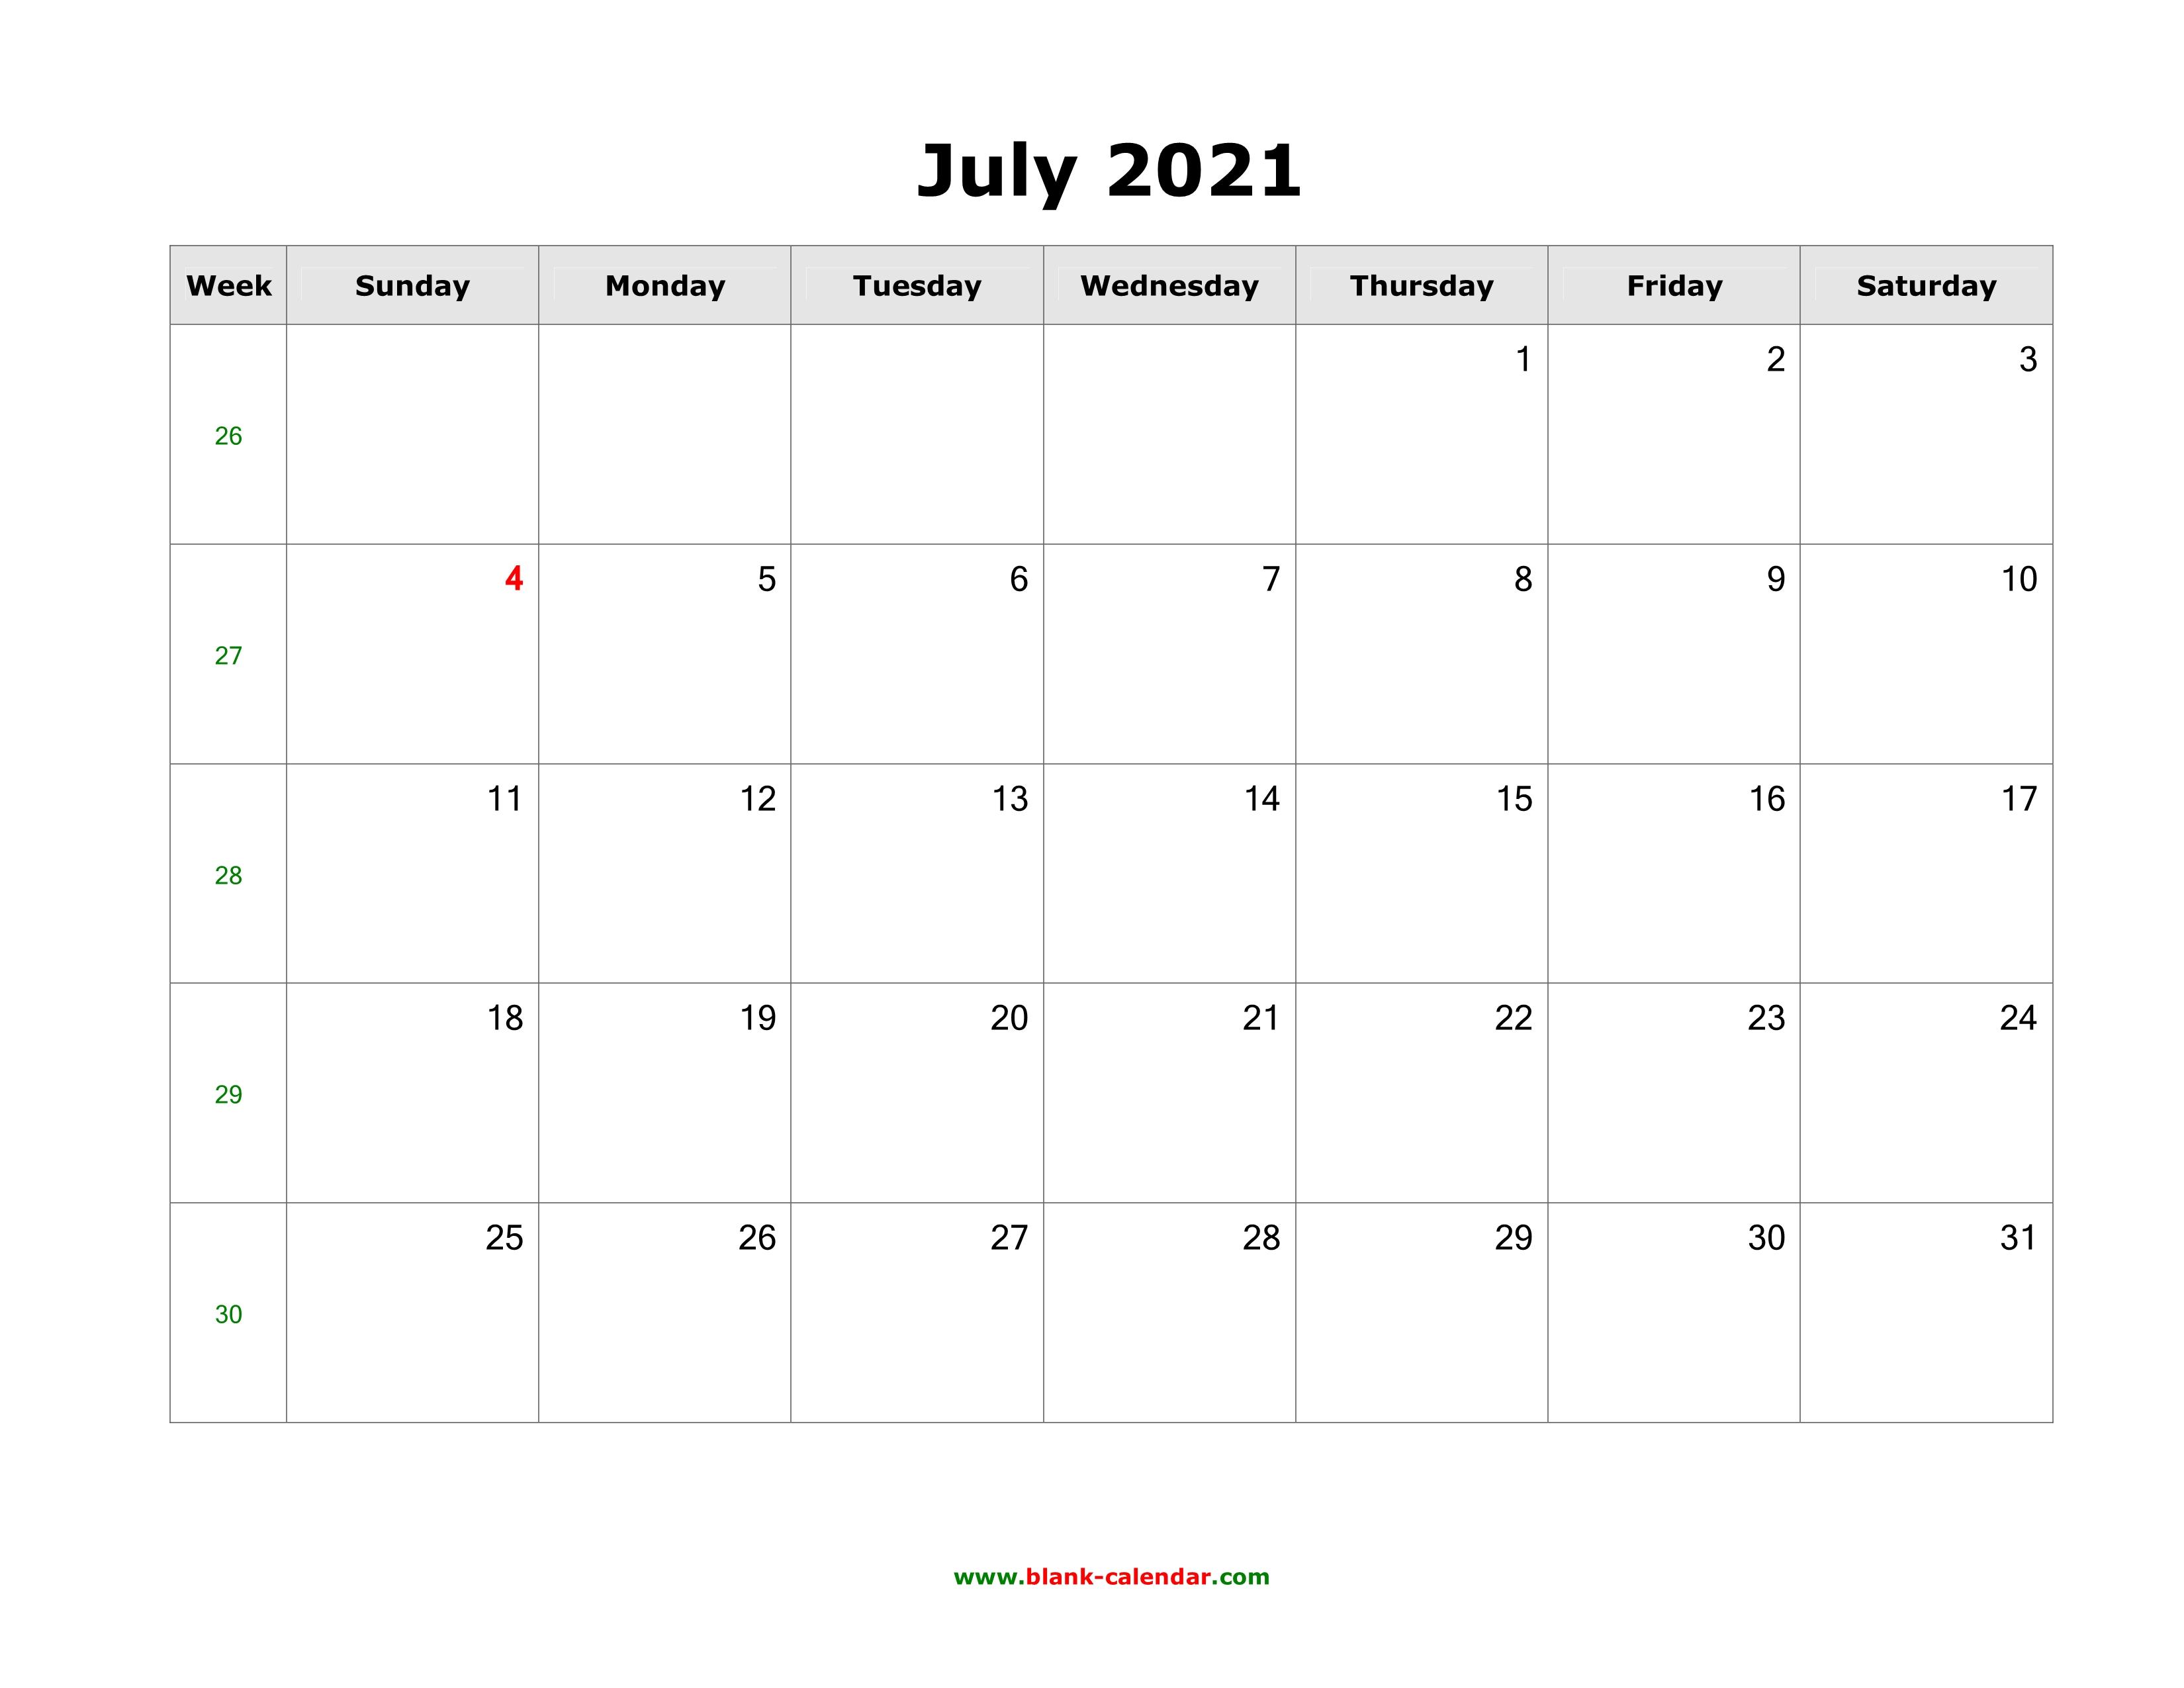 Download July 2021 Blank Calendar (horizontal)